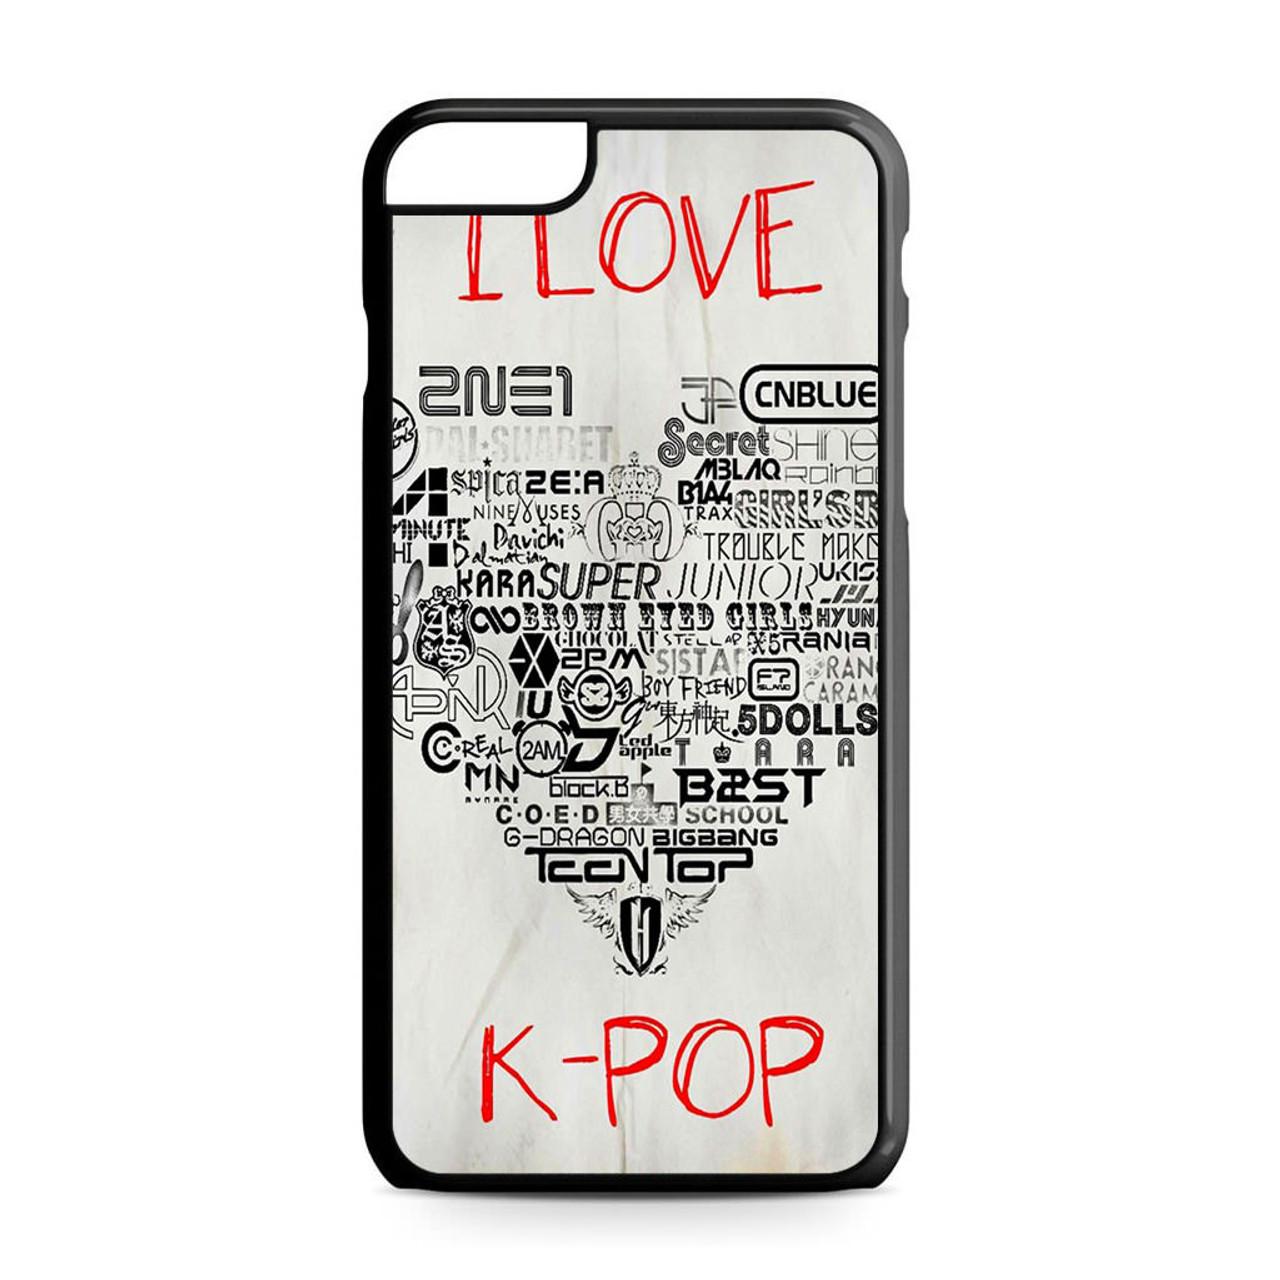 kpop iphone 6 case